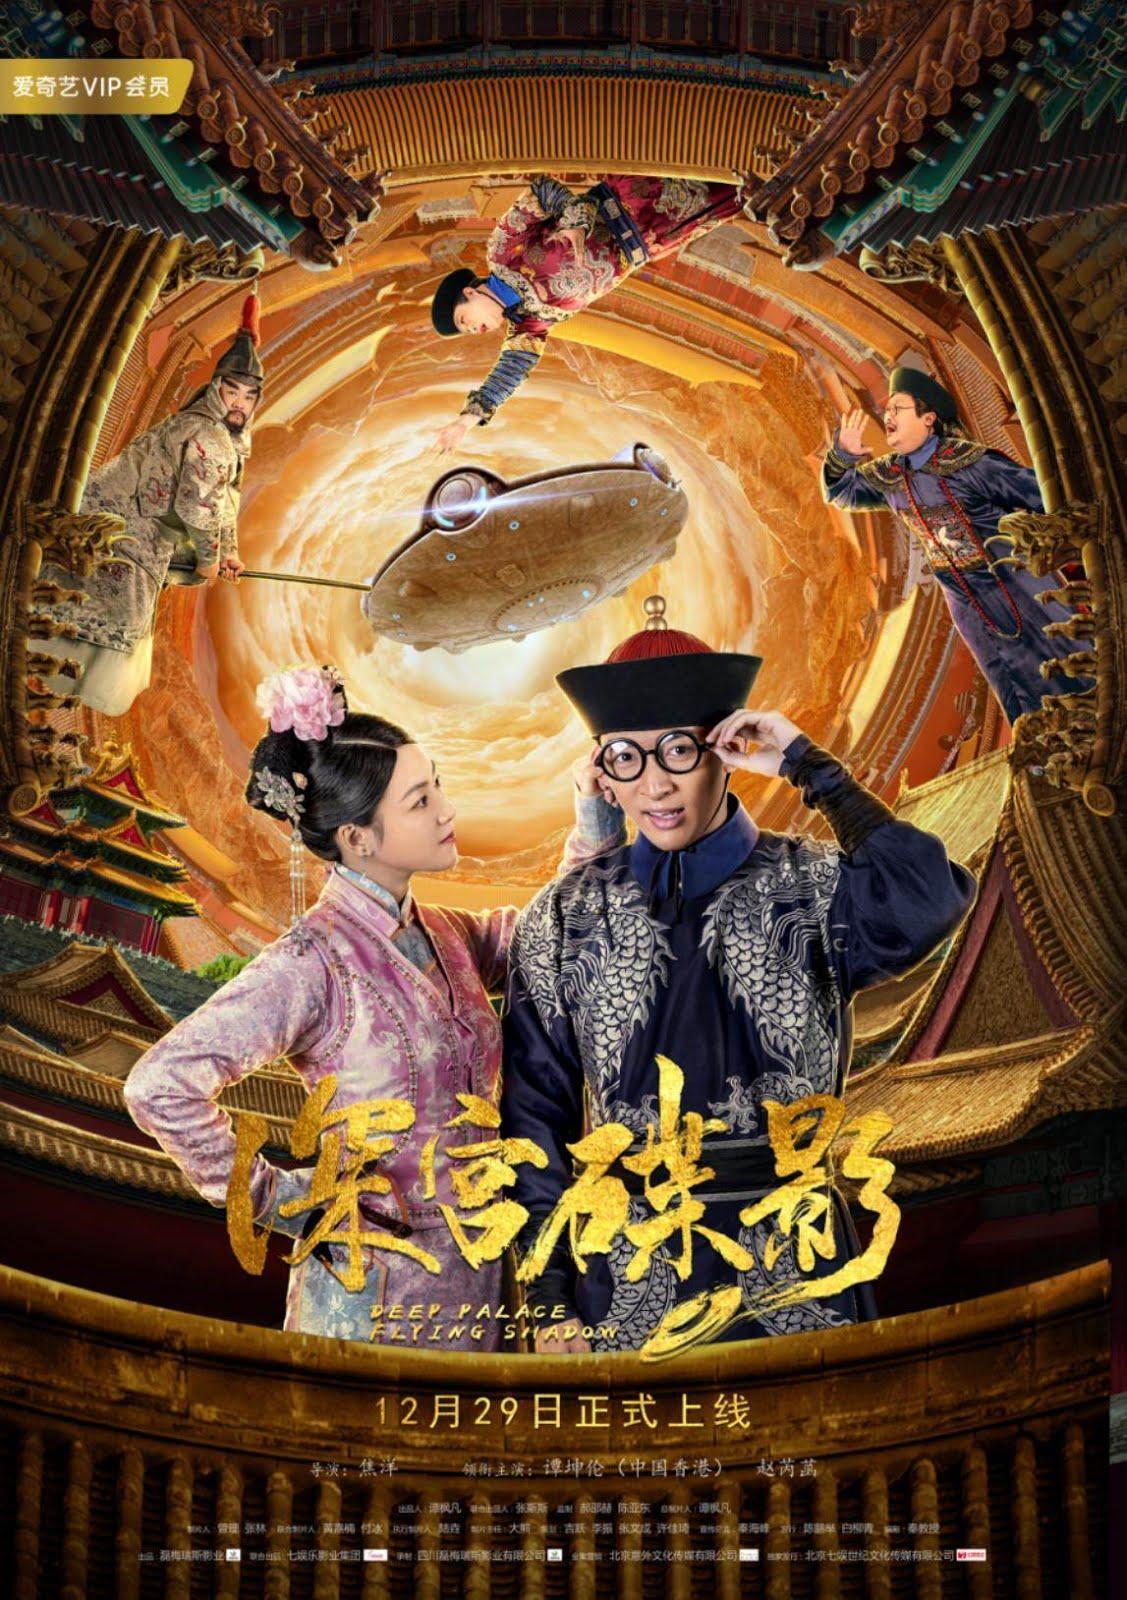 Deep Palace Flying Shadow (2019) Chinese 200MB HDRip 480p x264